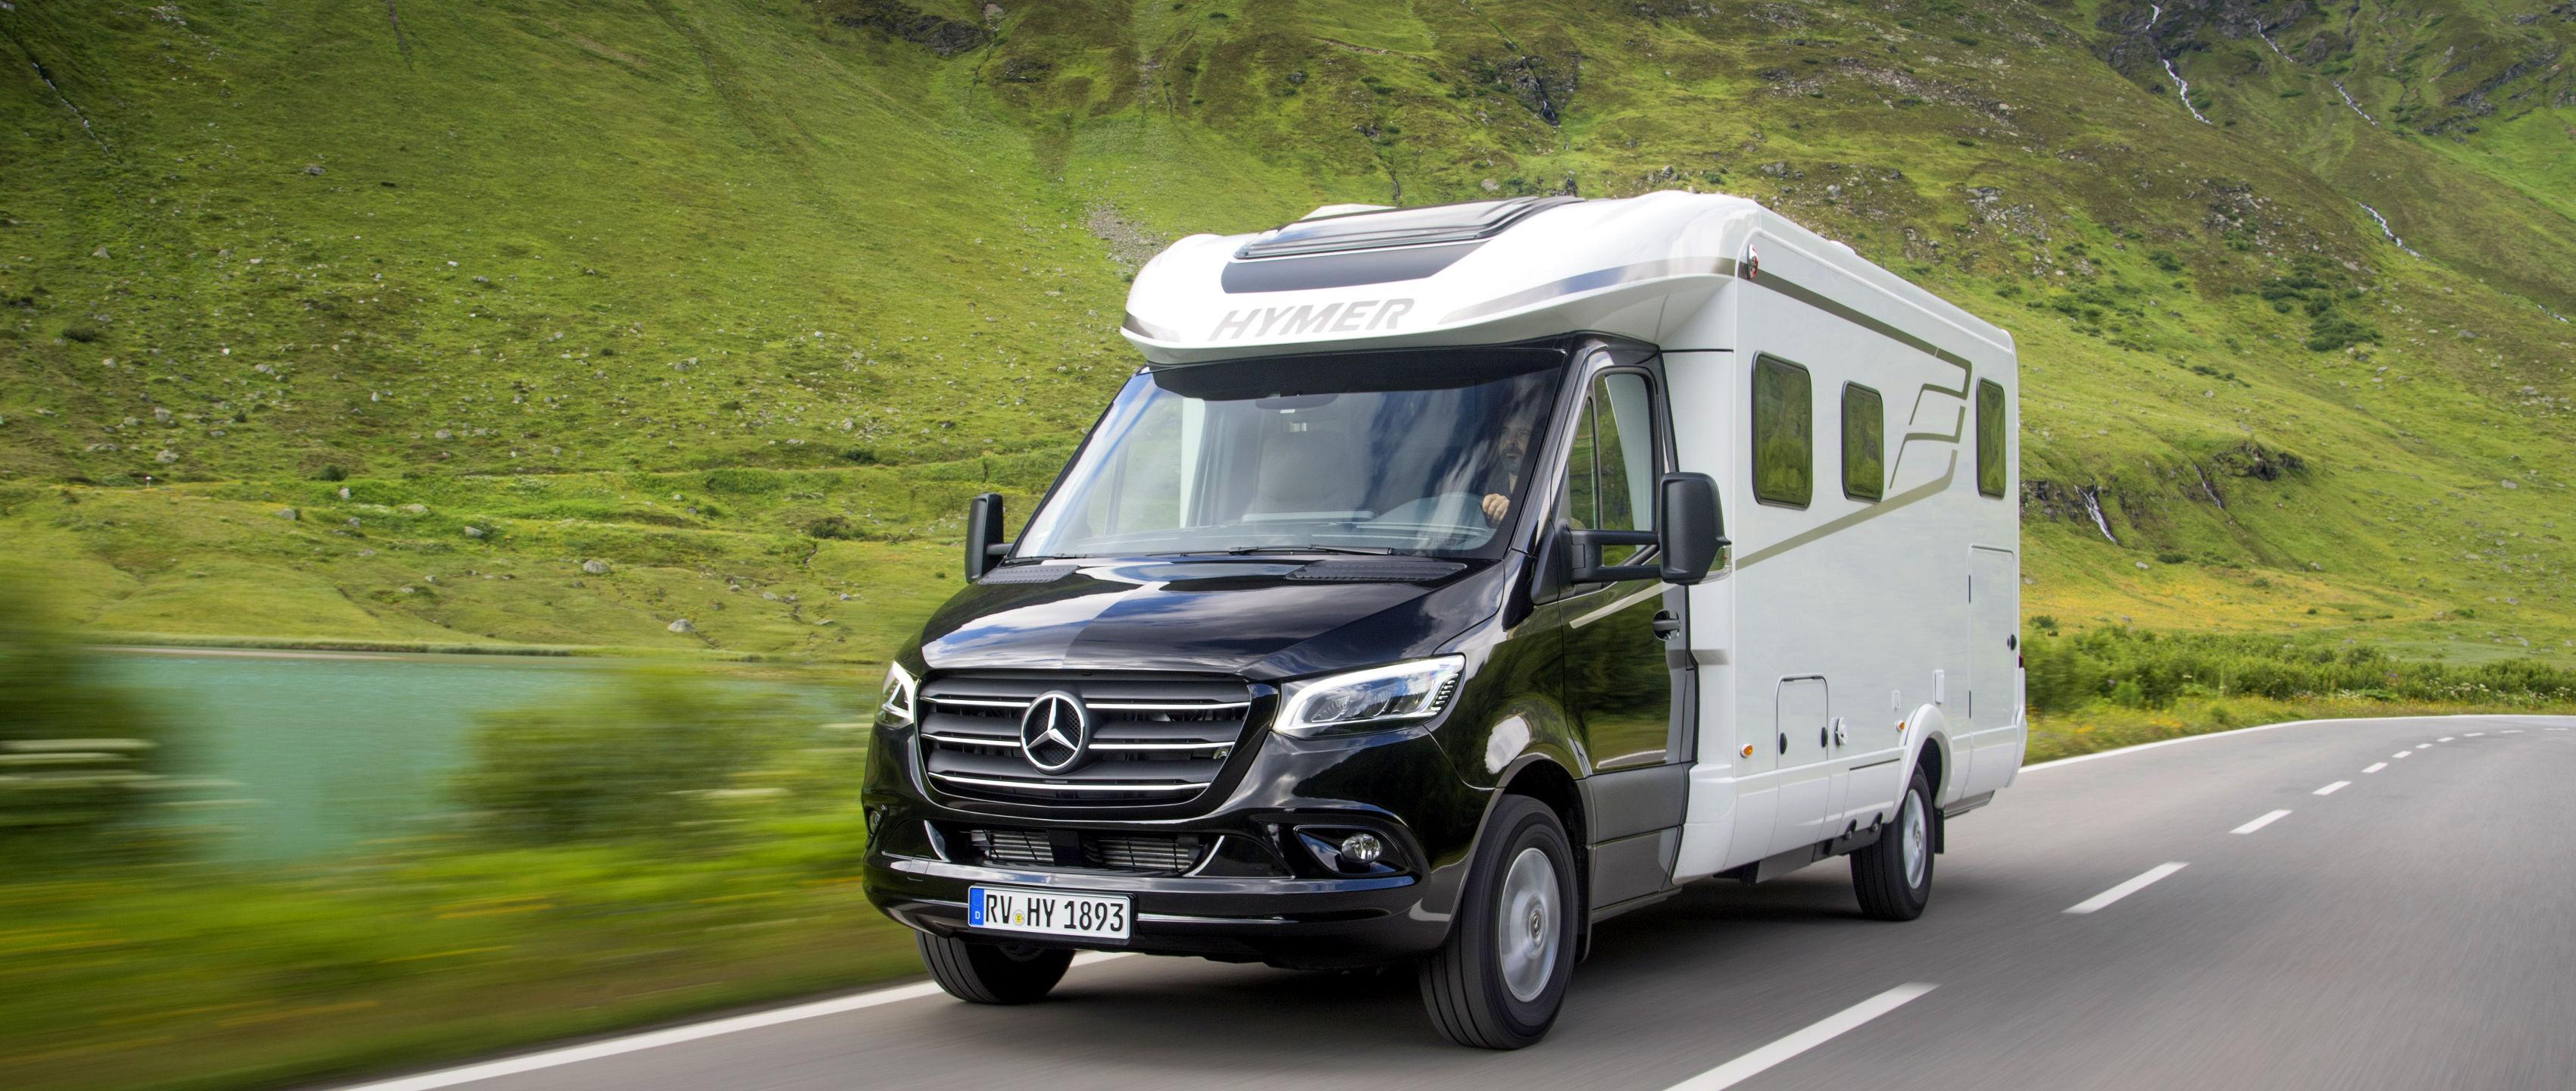 Wondrous Mercedes Benz Sprinter And Hymer Camper Vans Wiring Cloud Xempagosophoxytasticioscodnessplanboapumohammedshrineorg